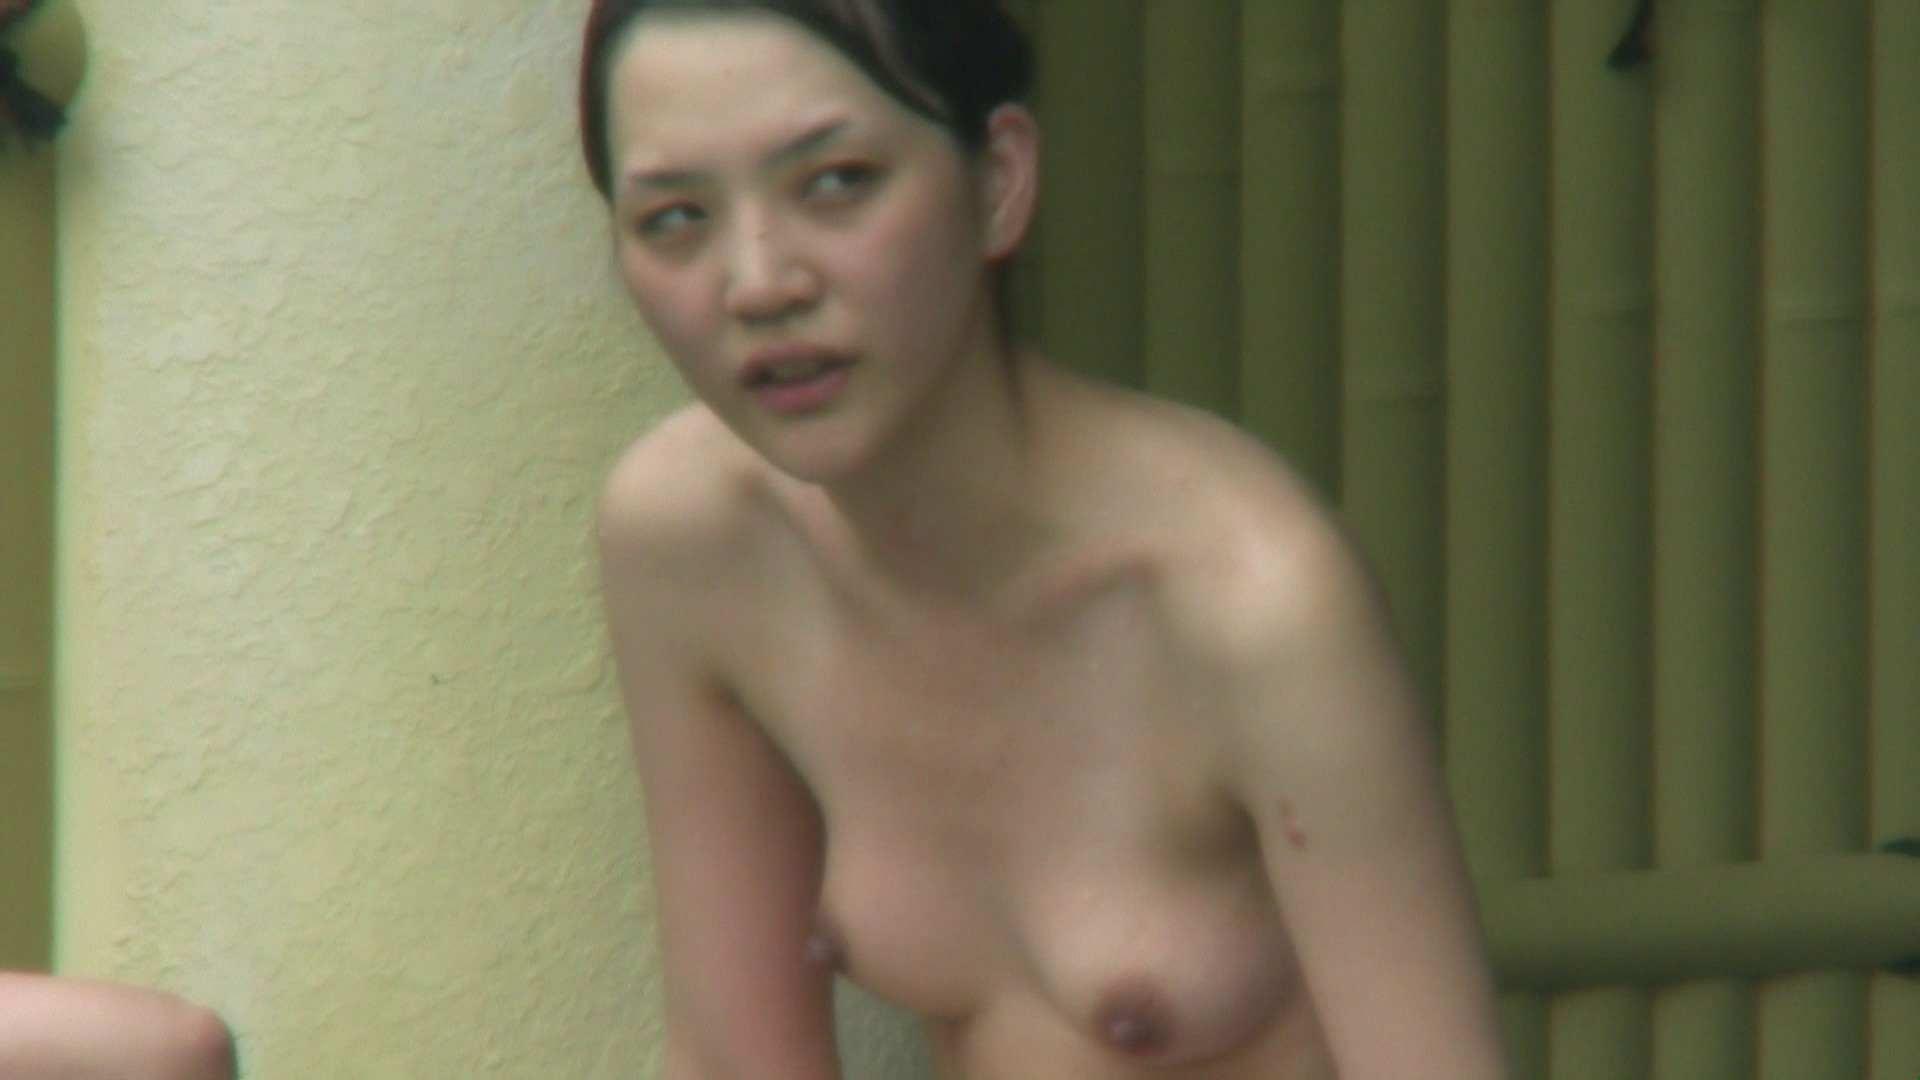 Aquaな露天風呂Vol.64【VIP限定】 露天風呂編 | 盗撮シリーズ  78PIX 55